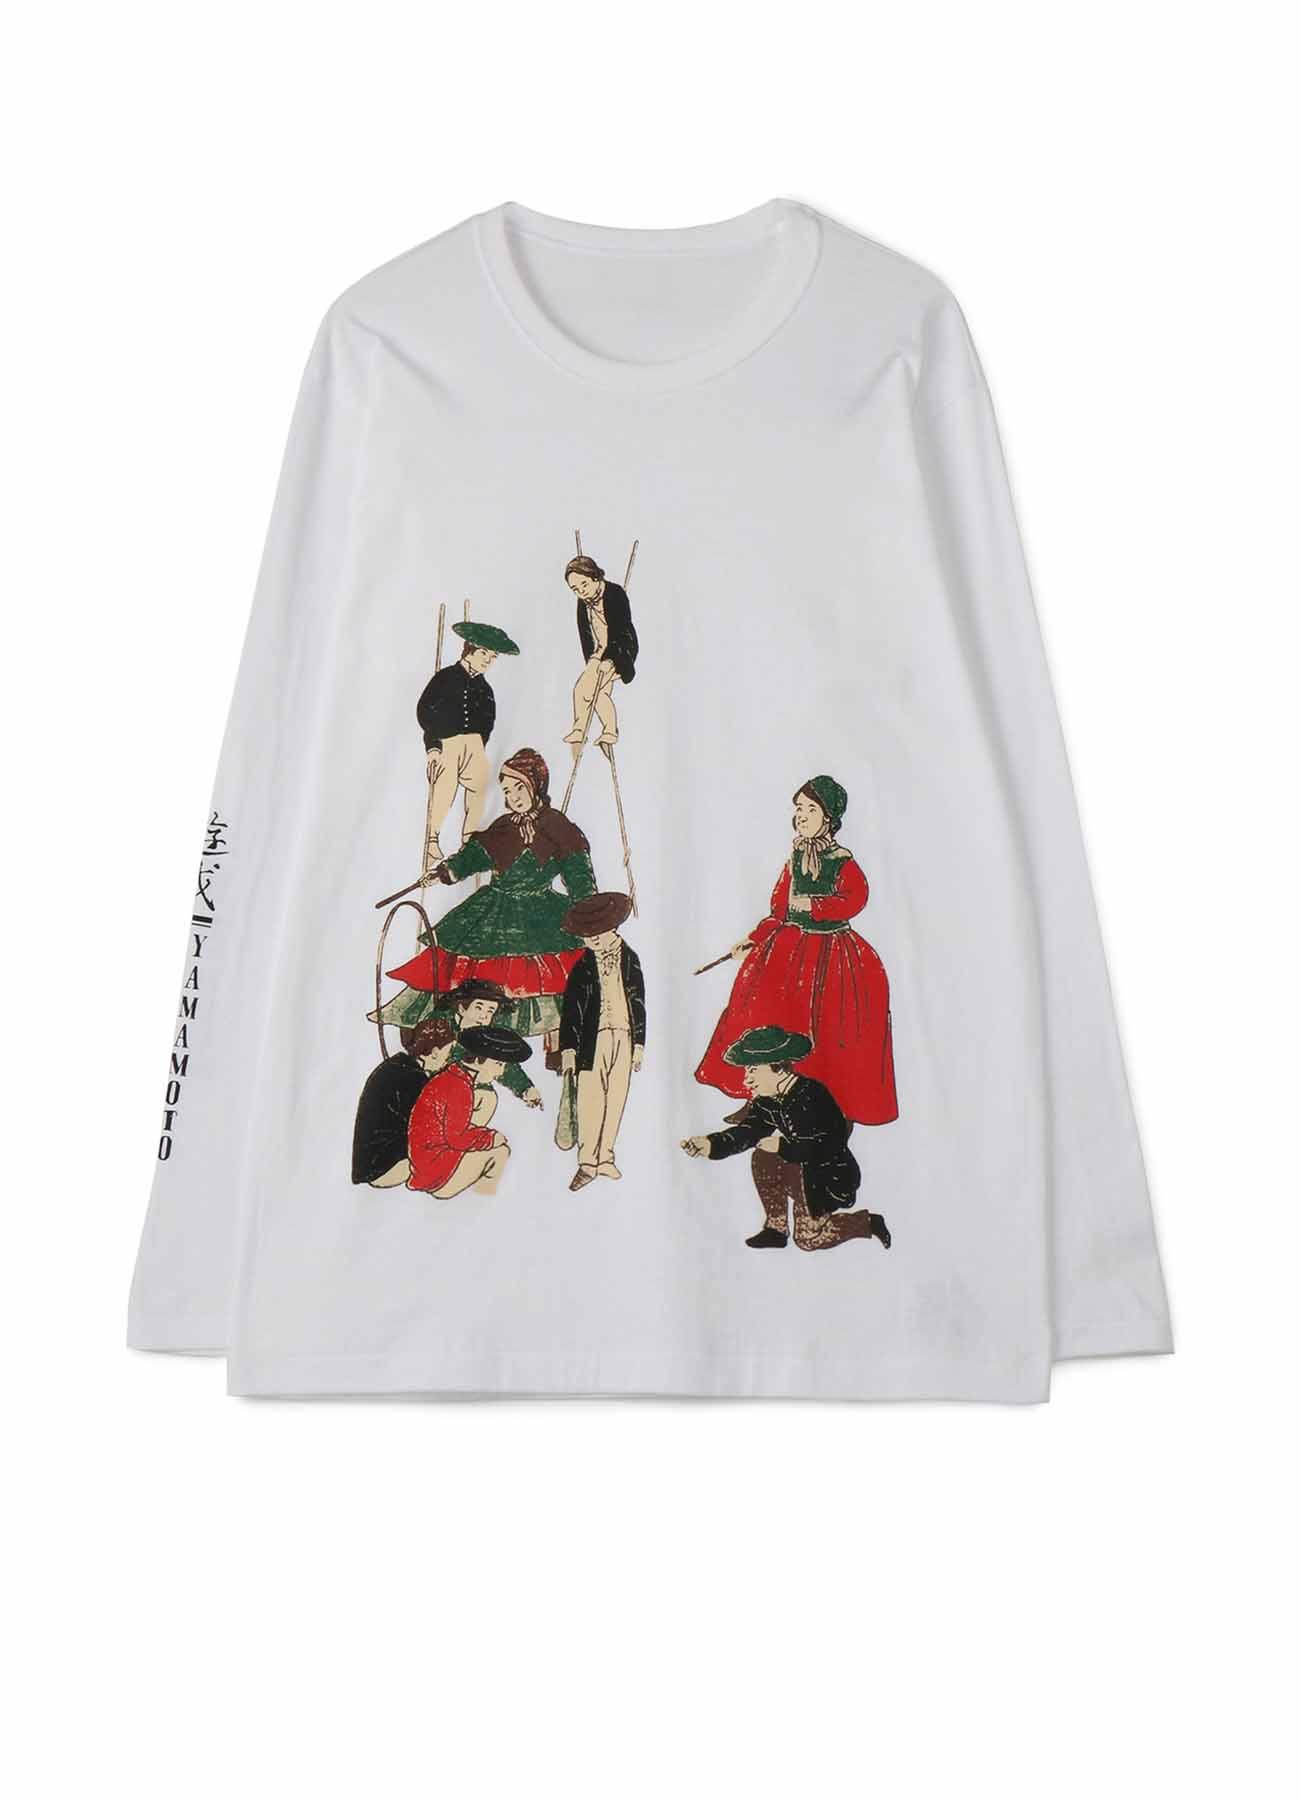 20/Cotton Jersey Rokumeikan Yuugi Memory Long Sleeve T-Shirt